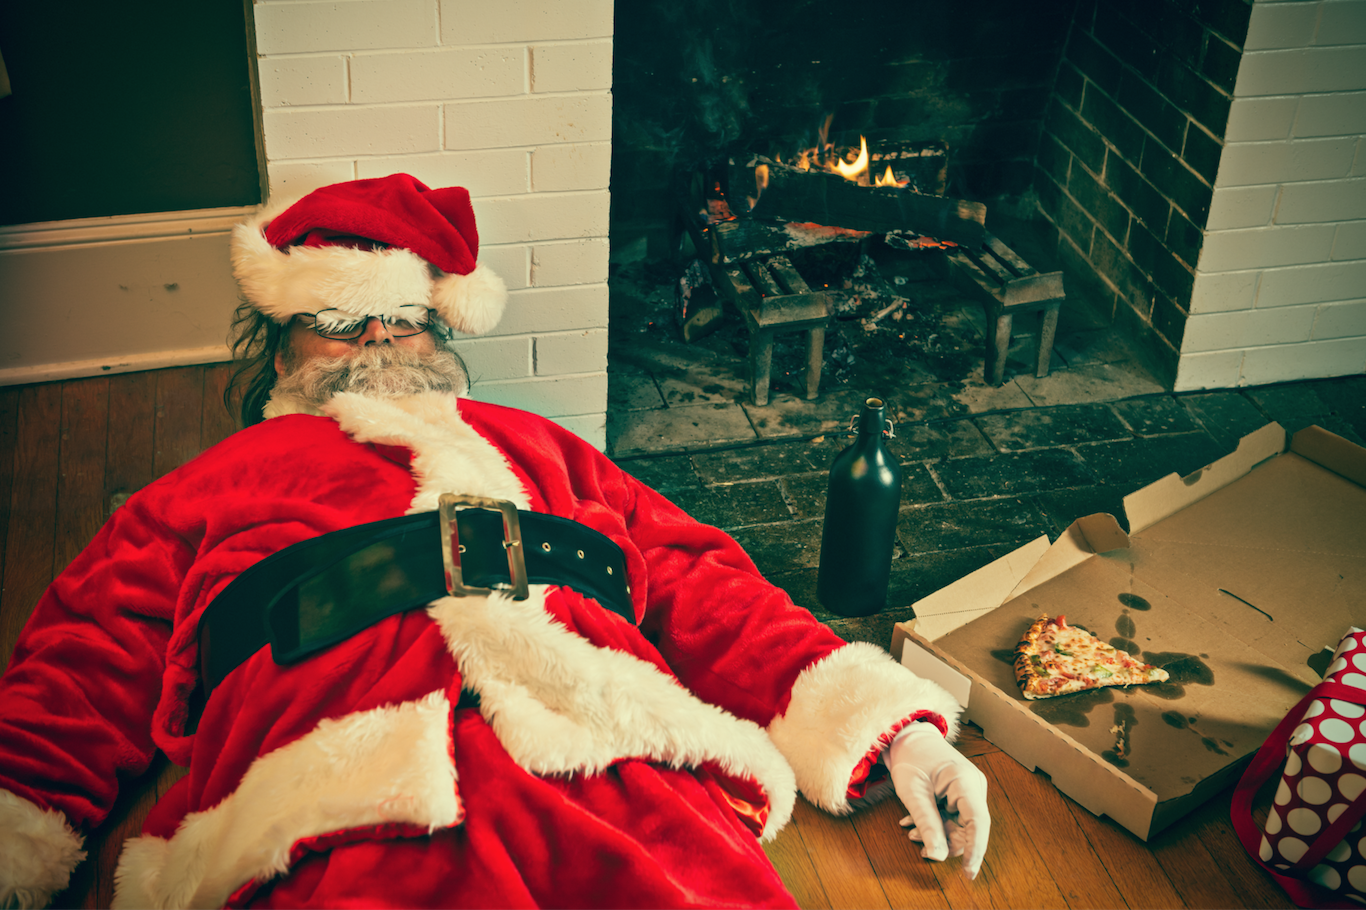 Anti-nadales per anar a la contra